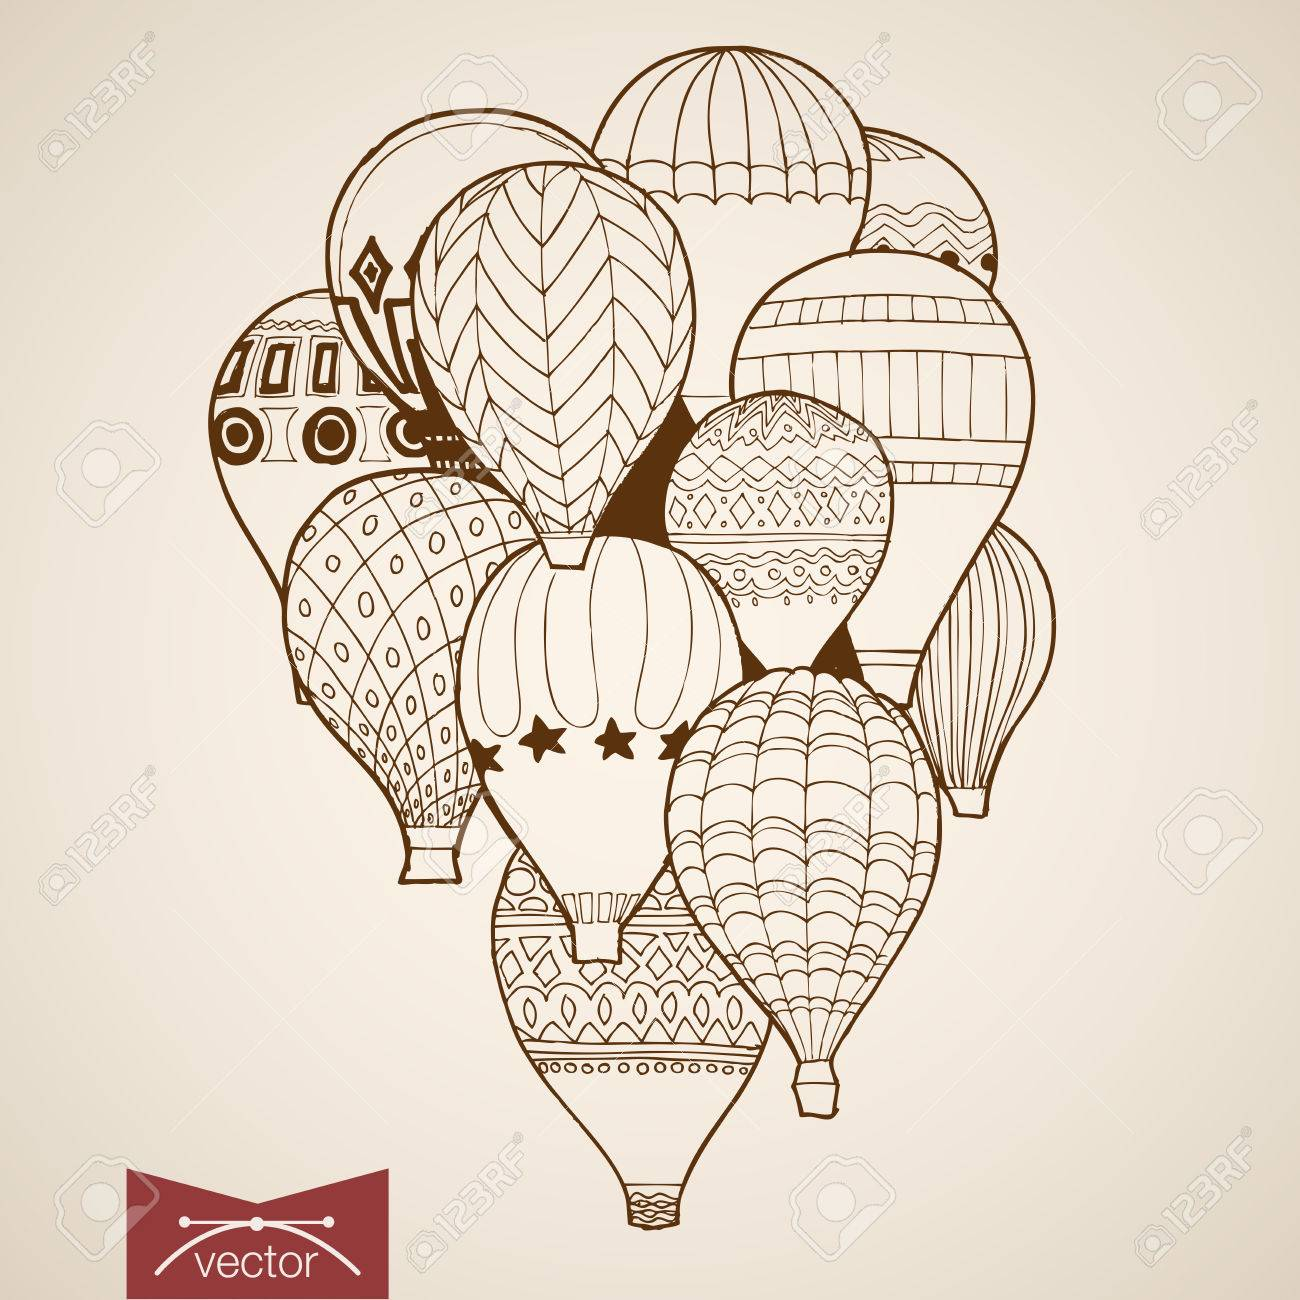 Engraving vintage hand drawn vector flying balloon pencil sketch illustration stock vector 61048295